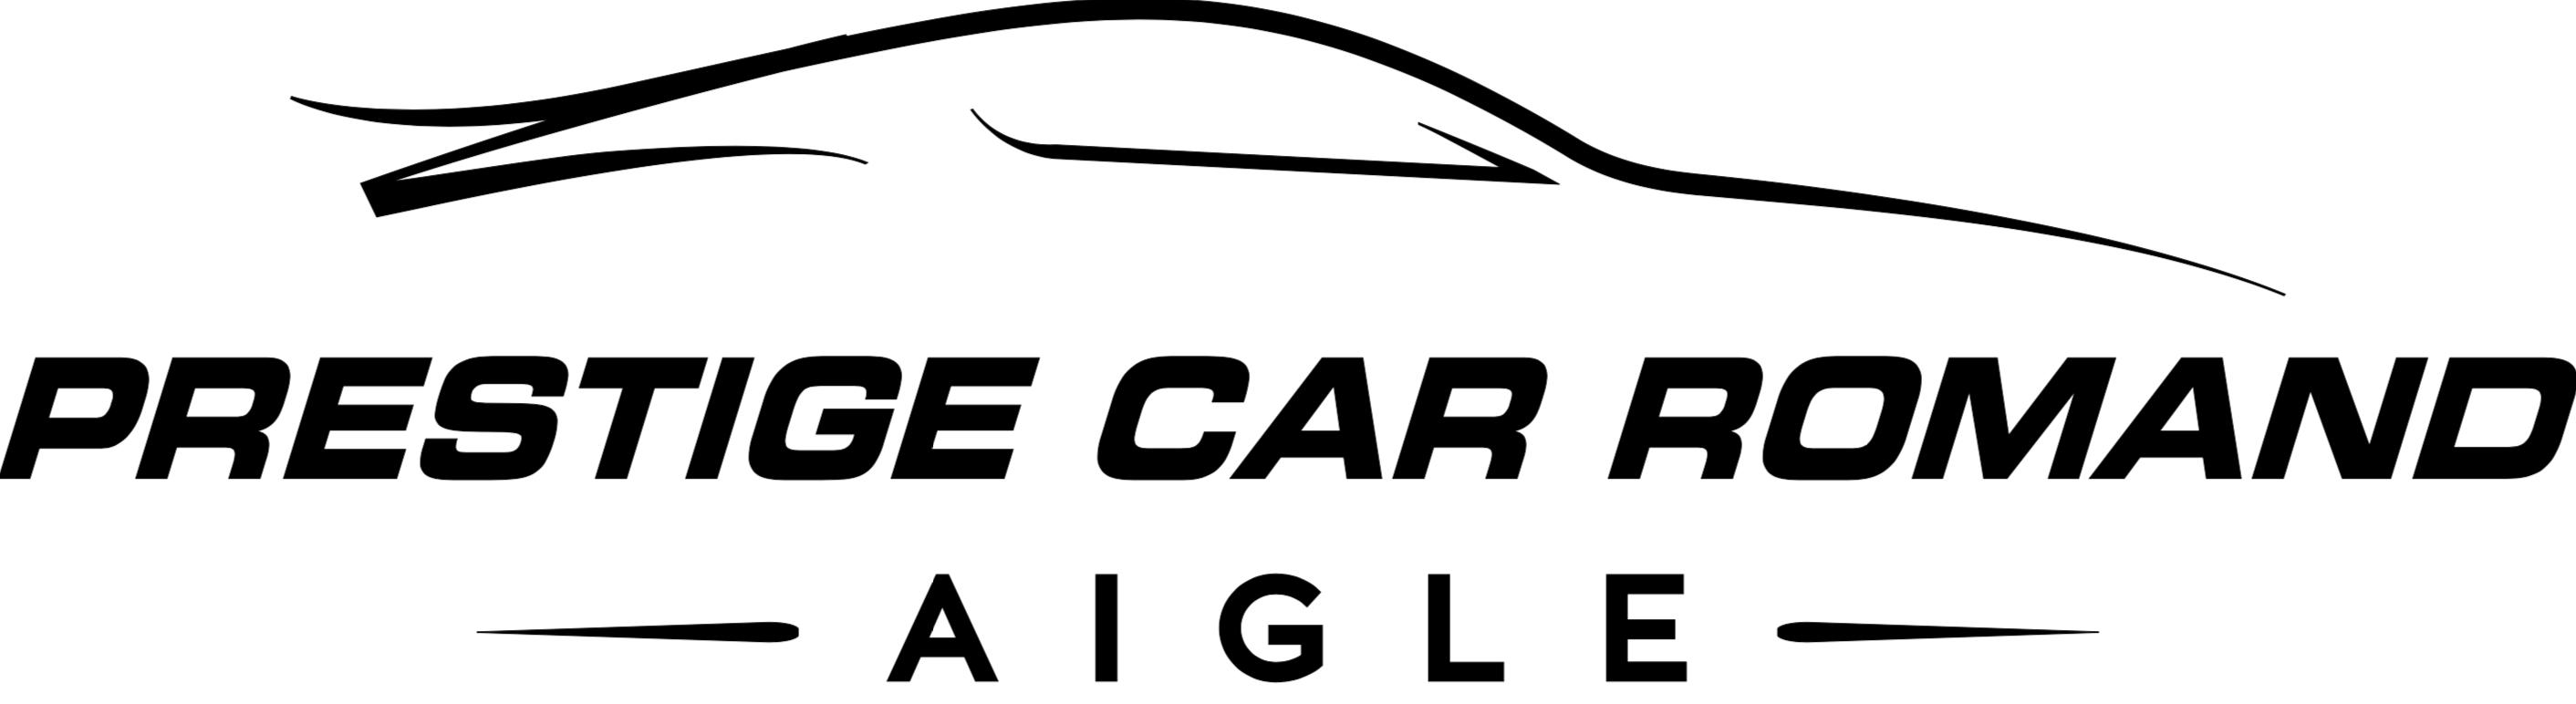 Location véhicule par Prestige Car Aigle